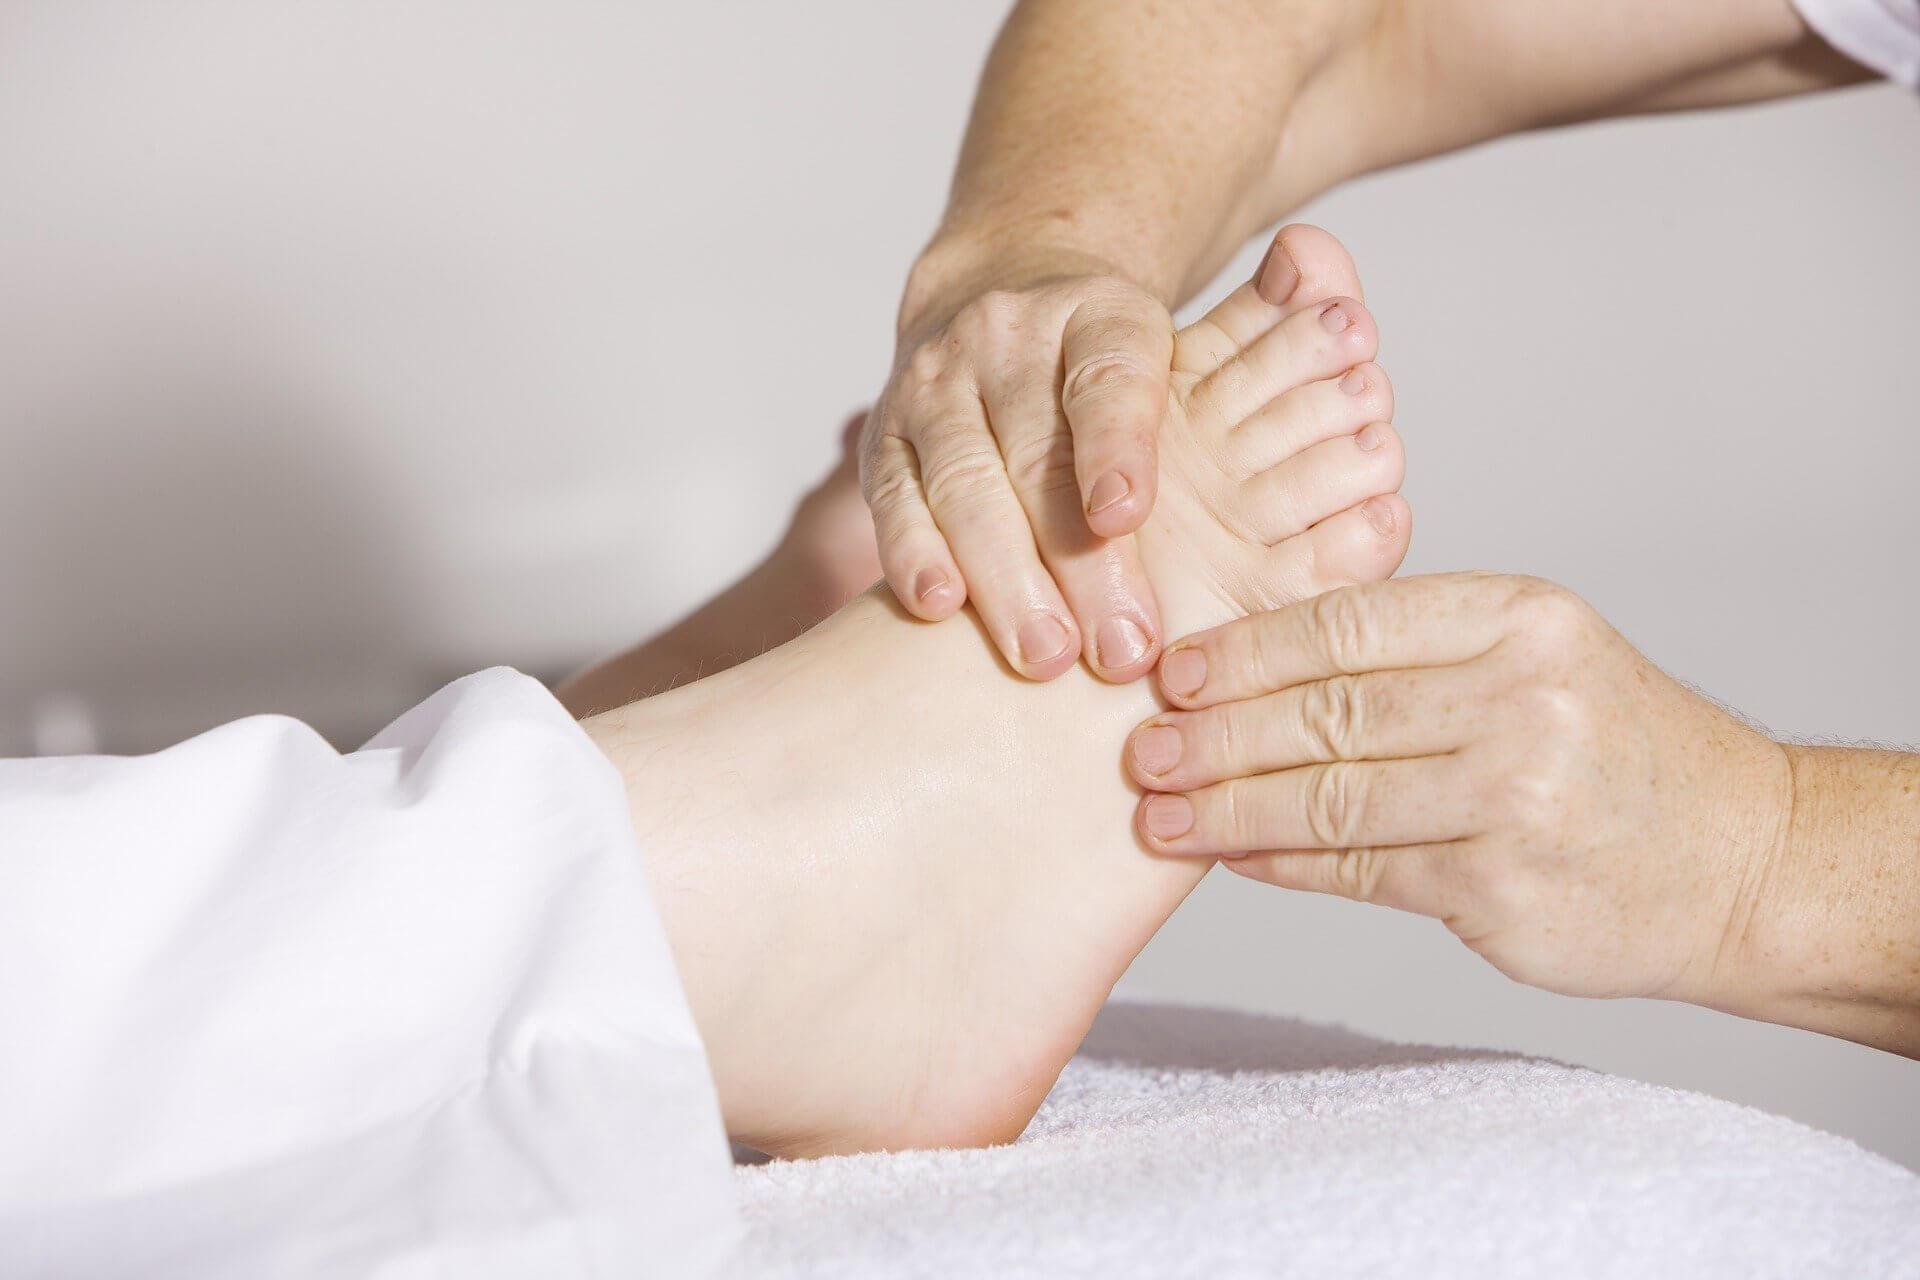 boli articulare tratament artroza genunchiului tratamentul artrozei sinoviale